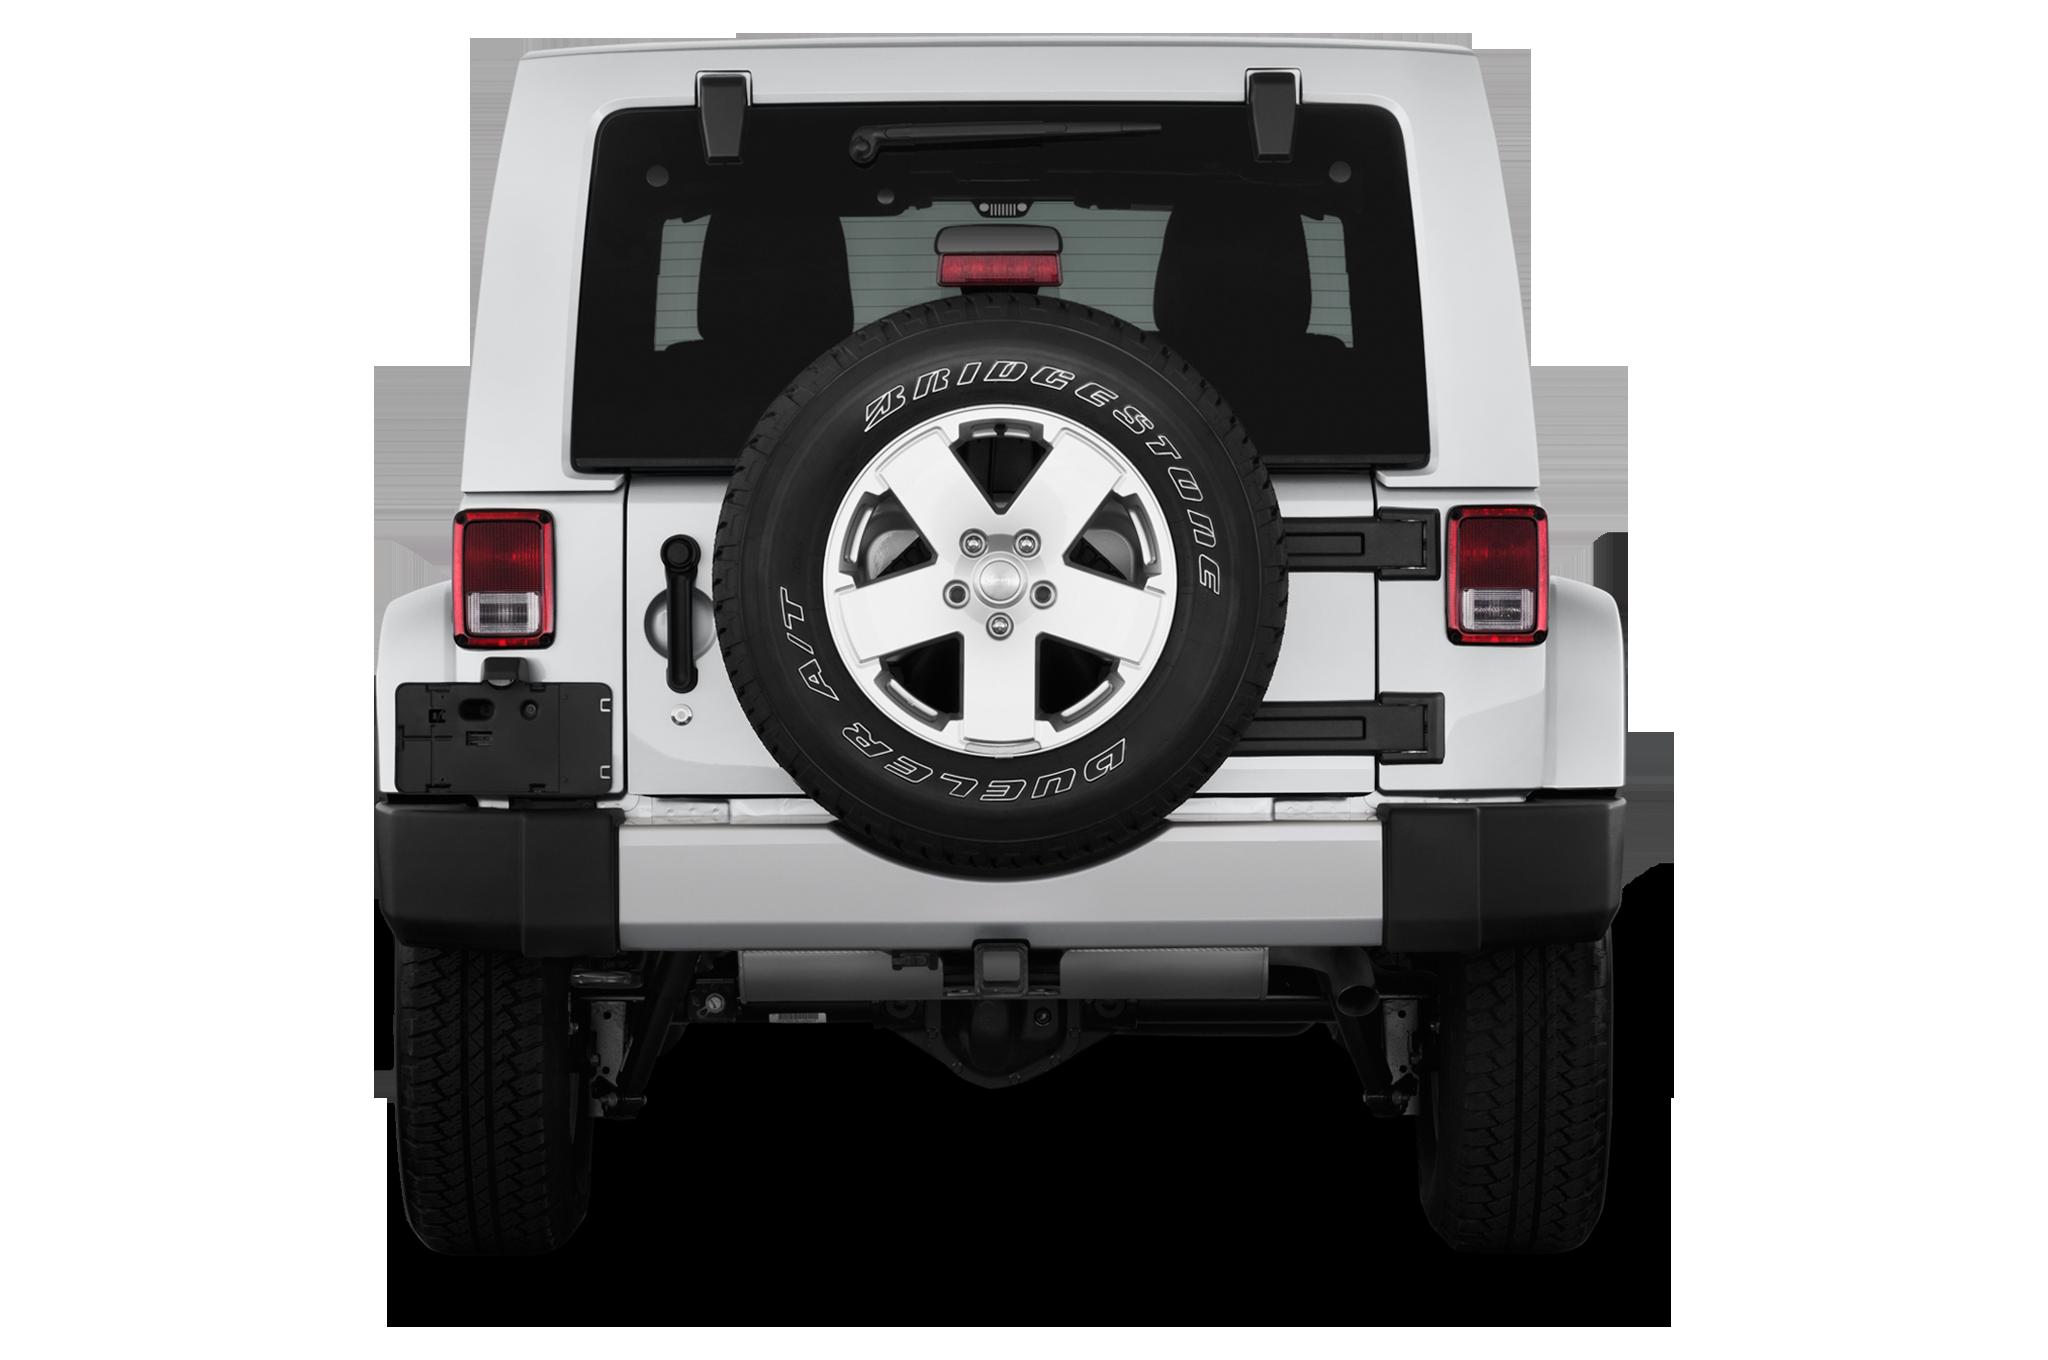 2012 Jeep Wrangler Unlimited Altitude Edition Editors